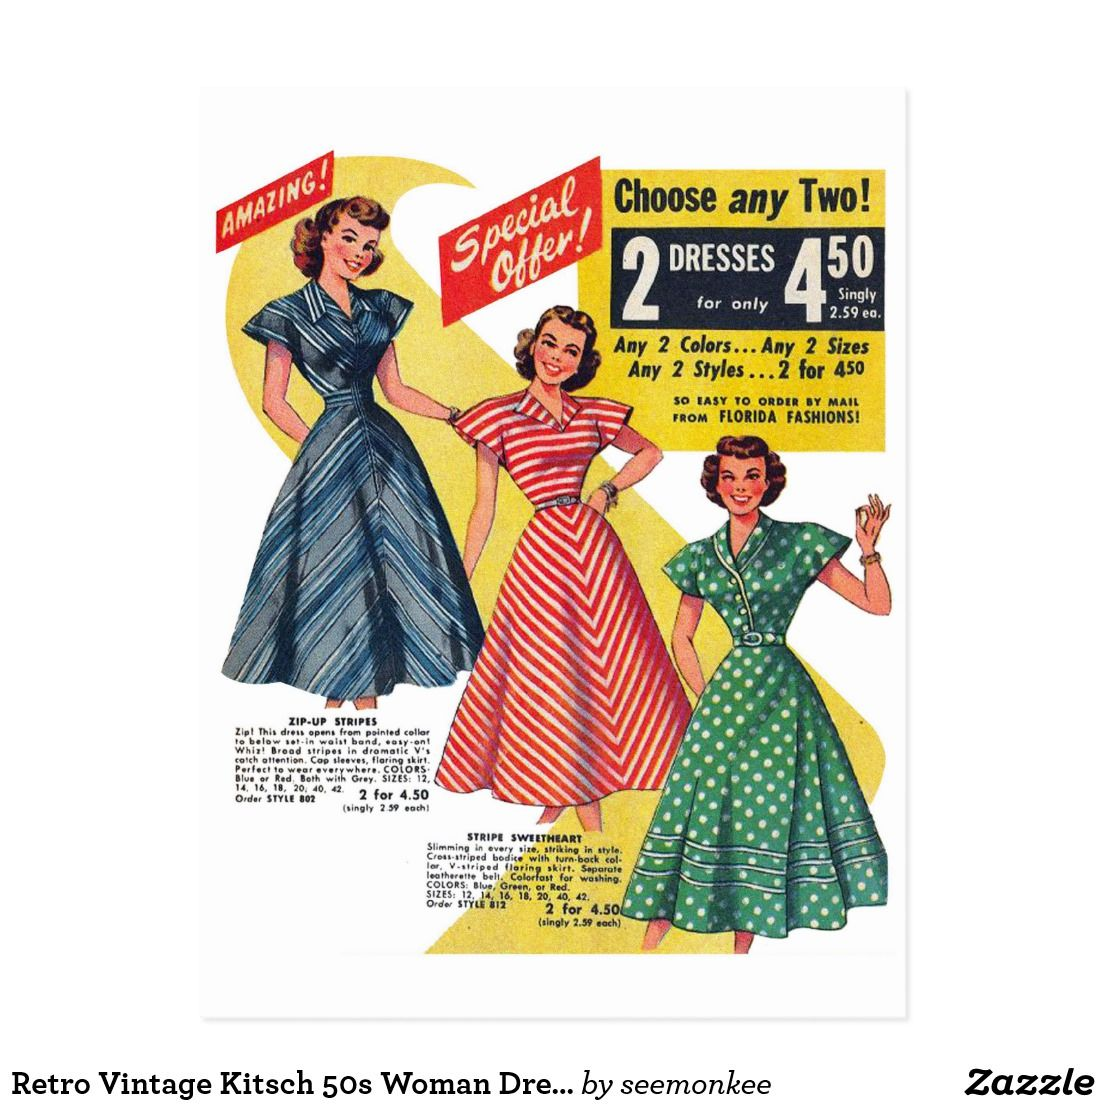 aa43e24f0c909 Retro Vintage Kitsch 50s Woman Dresses Fashion Ad Postcard | Zazzle ...